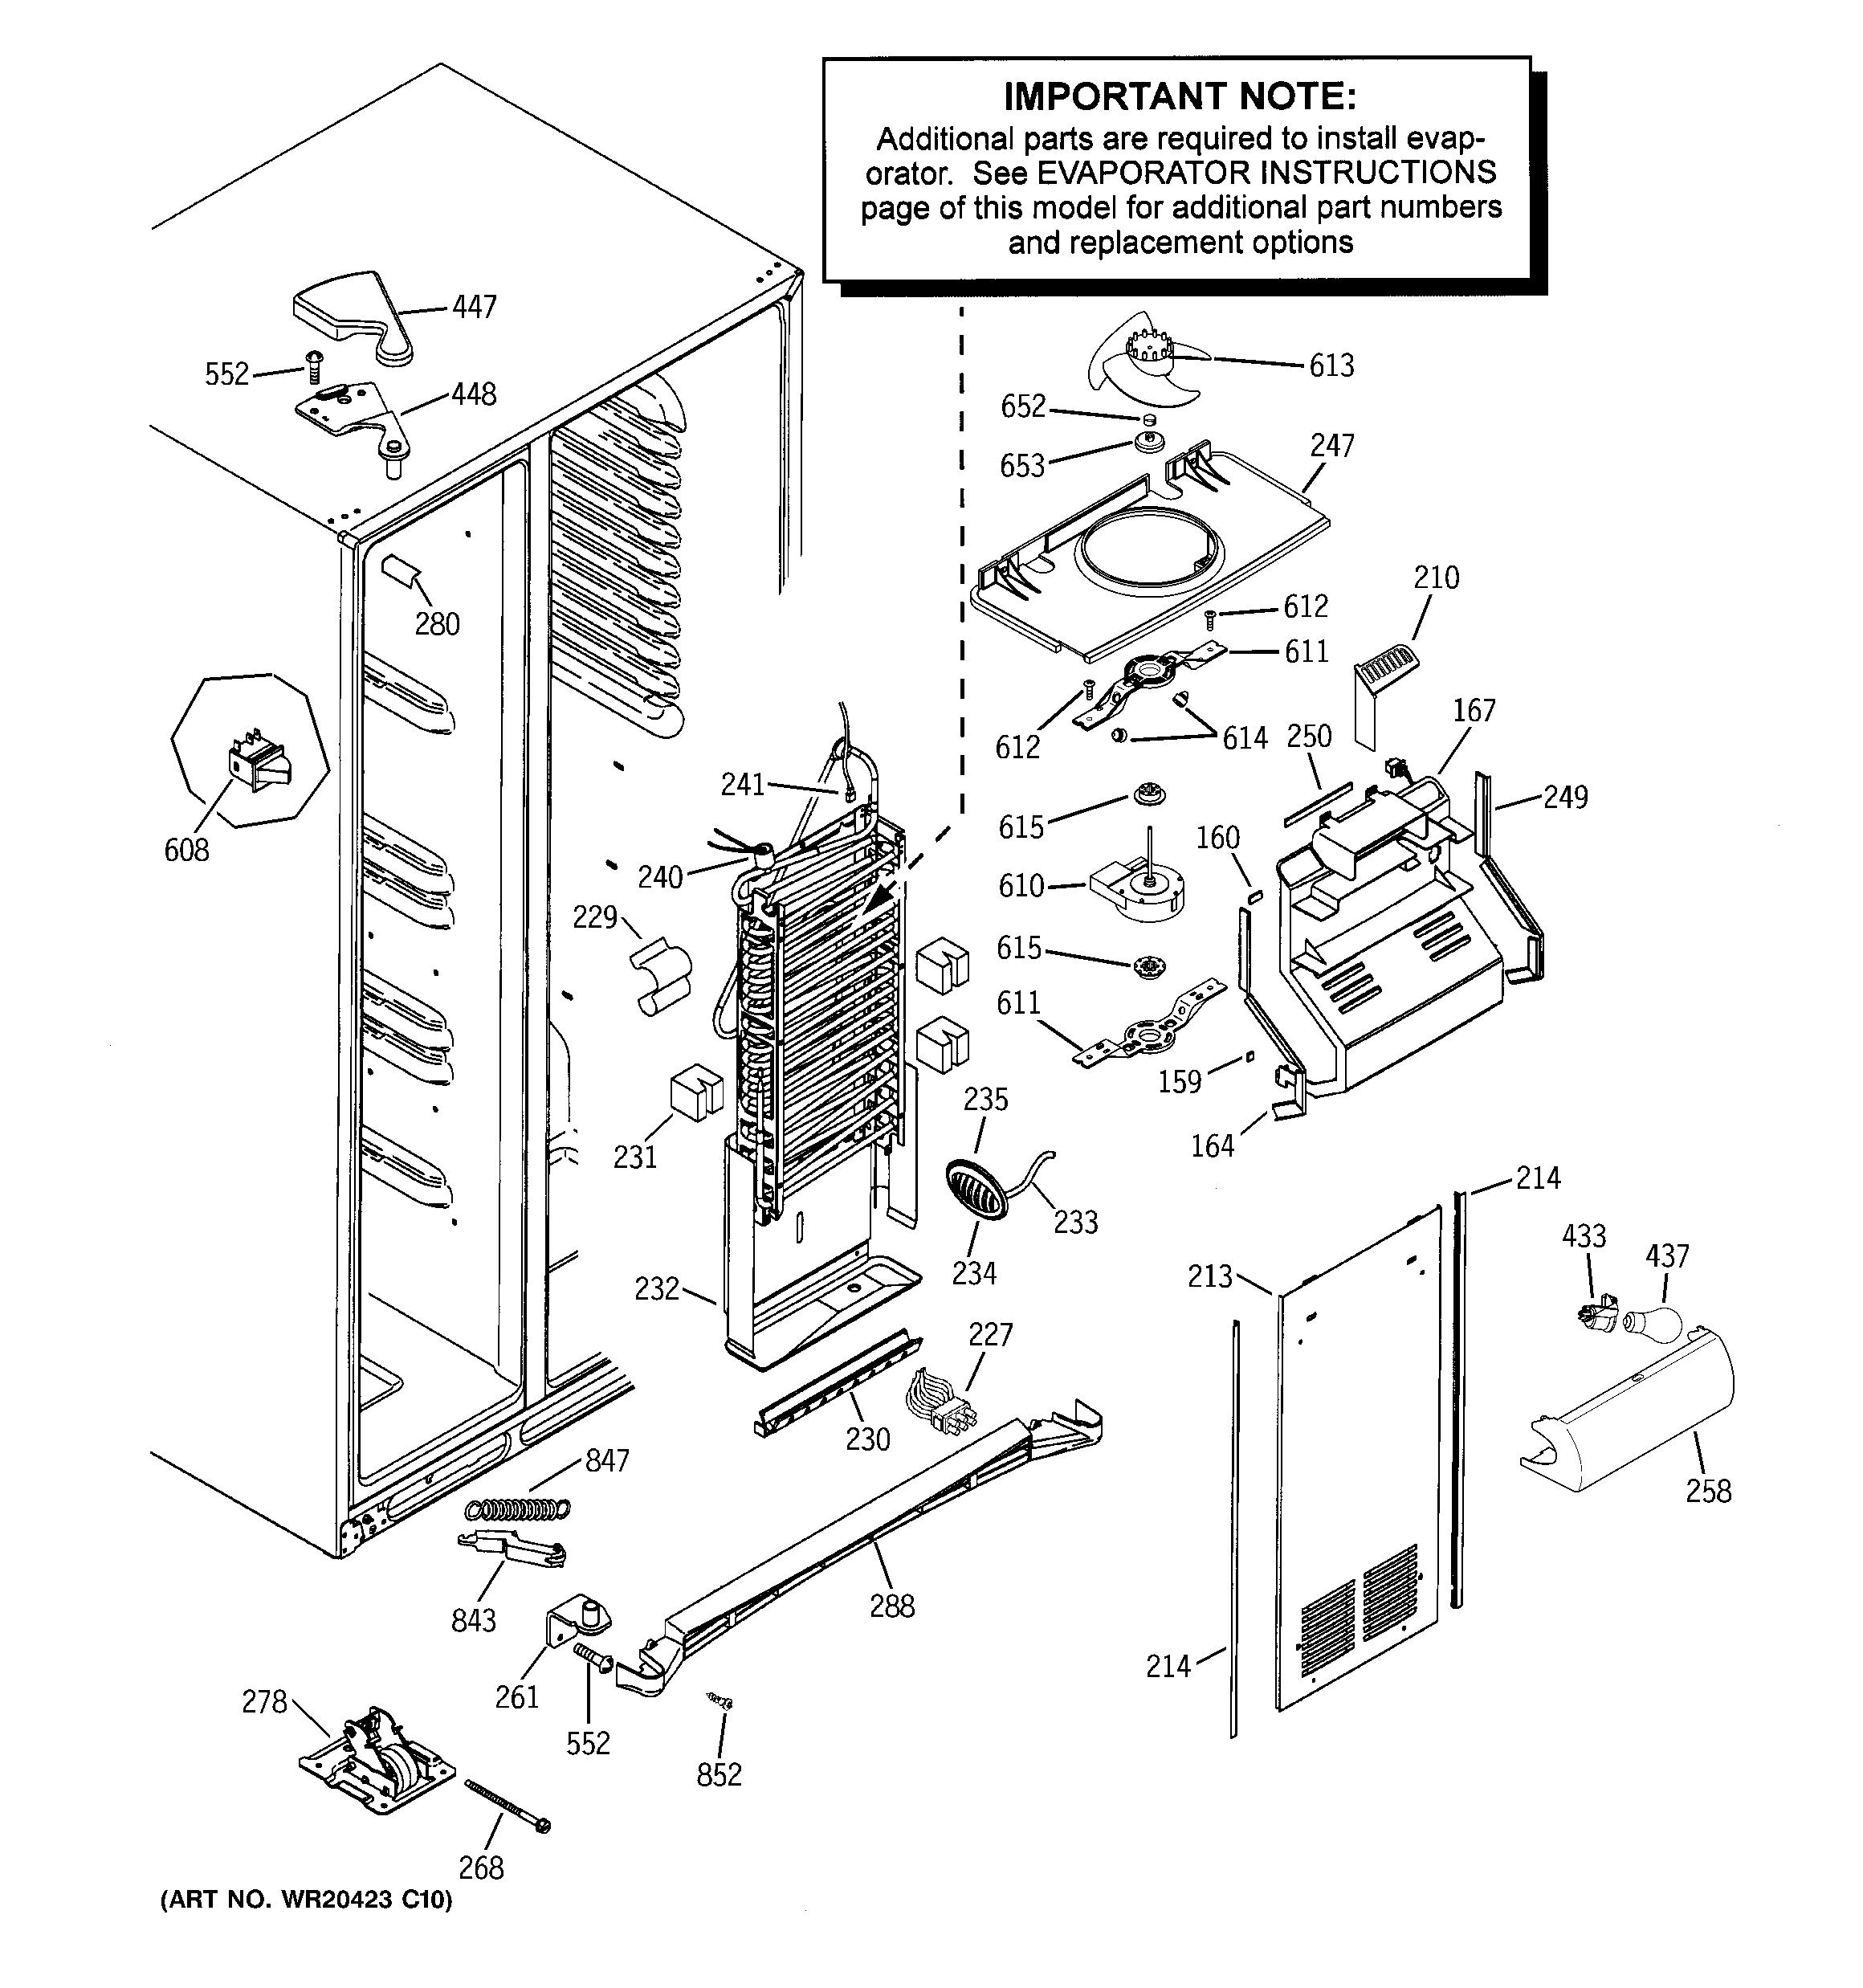 Ge Side By Side Refrigerator Wiring Diagram - 2000 Mitsubishi Montero Sport  Fuse Box - fusebox.1997wir.jeanjaures37.fr   Ge Monogram Refrigerator Wiring Diagram      Wiring Diagram Resource